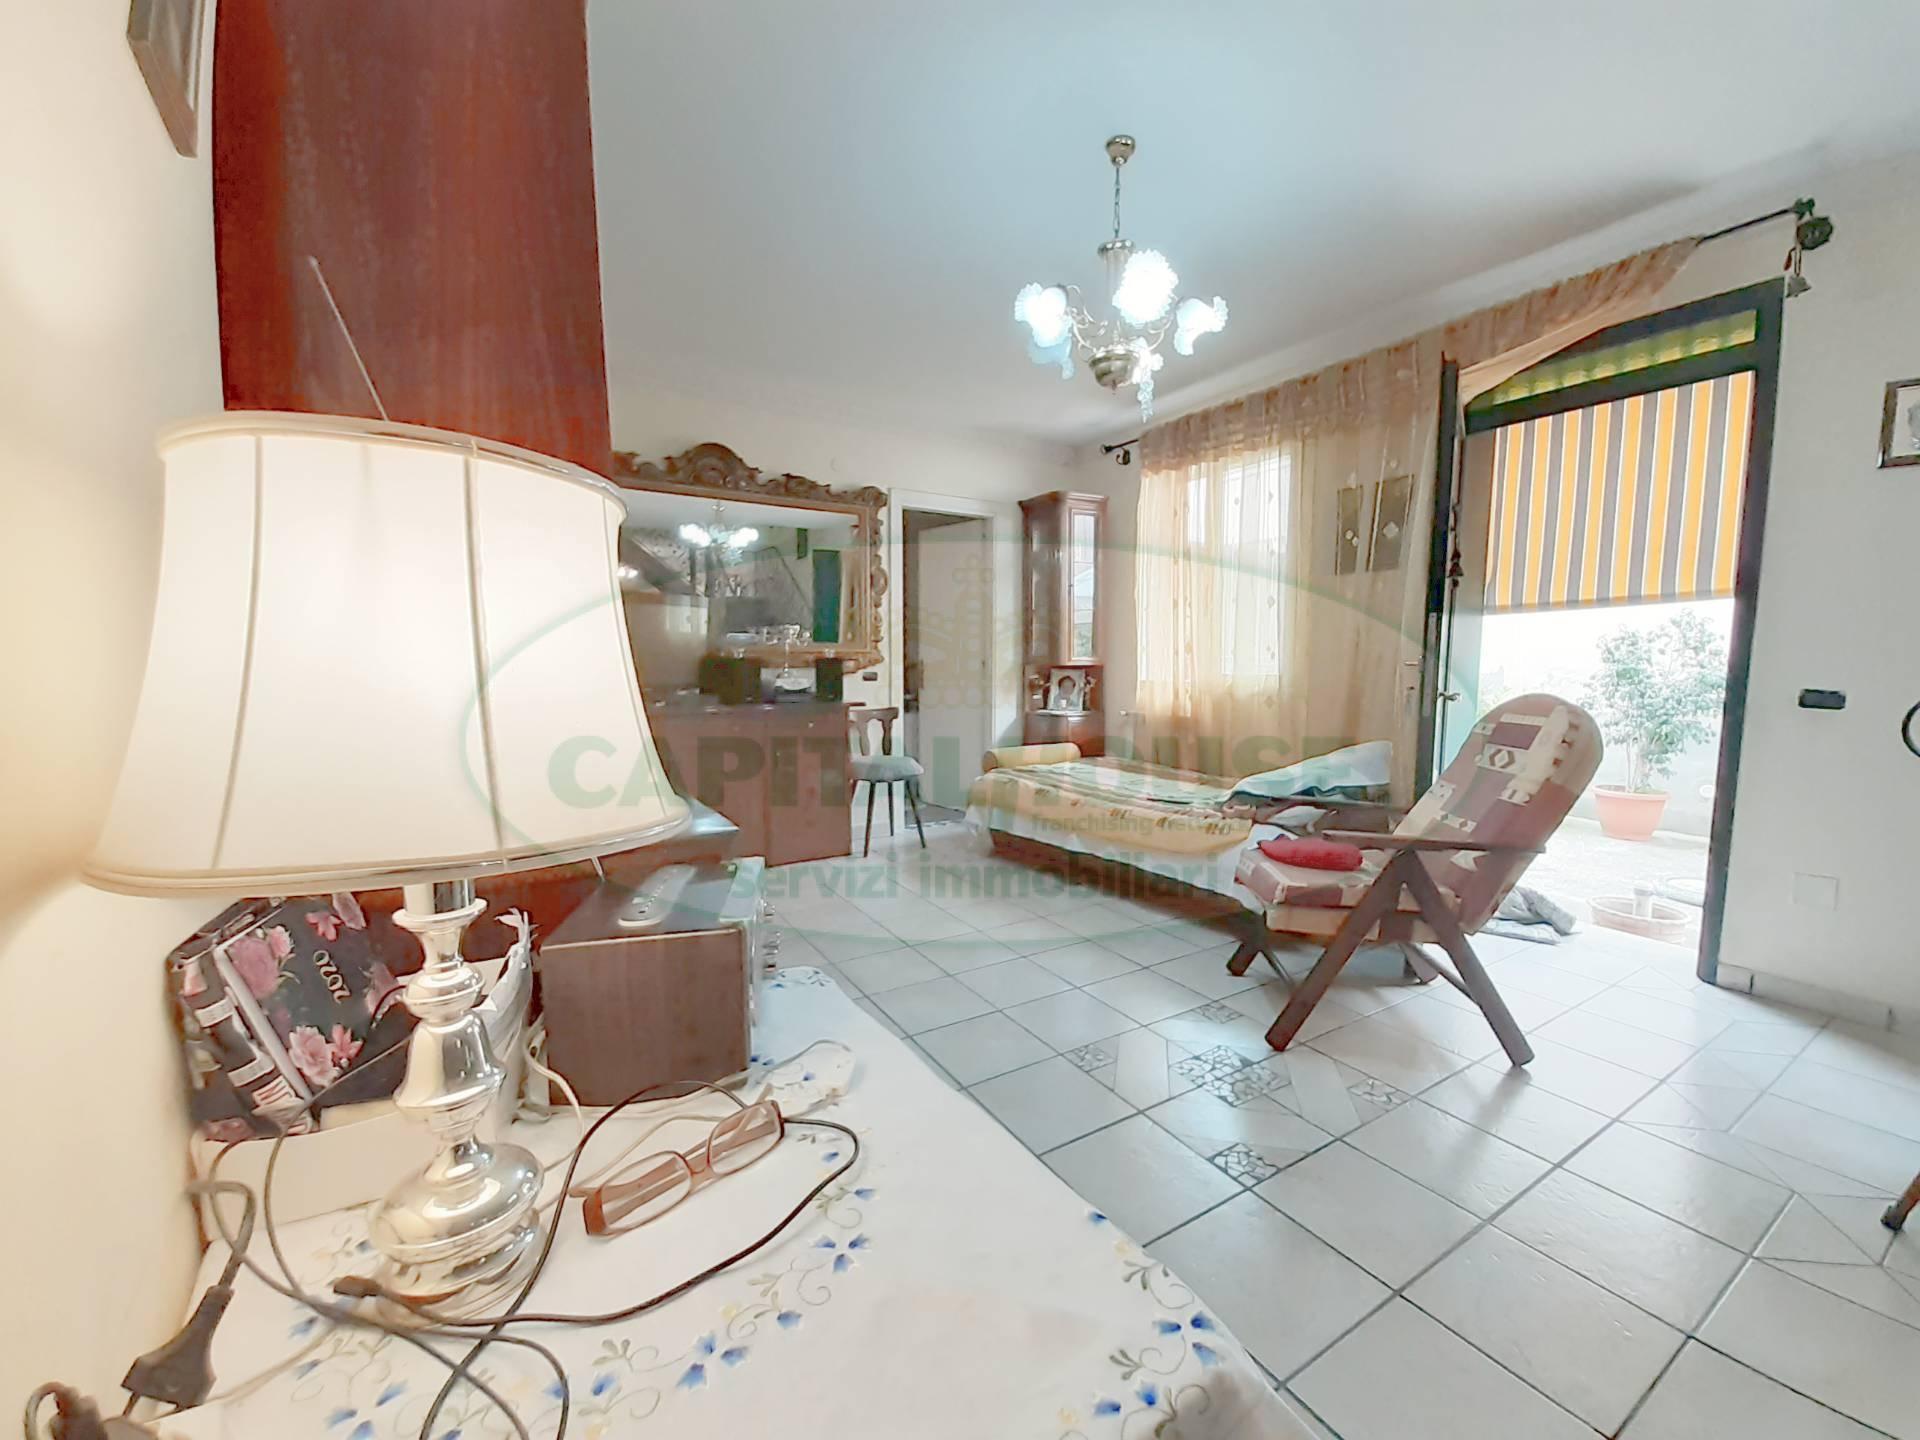 Casa indipendente in vendita a Portico Di Caserta (CE)